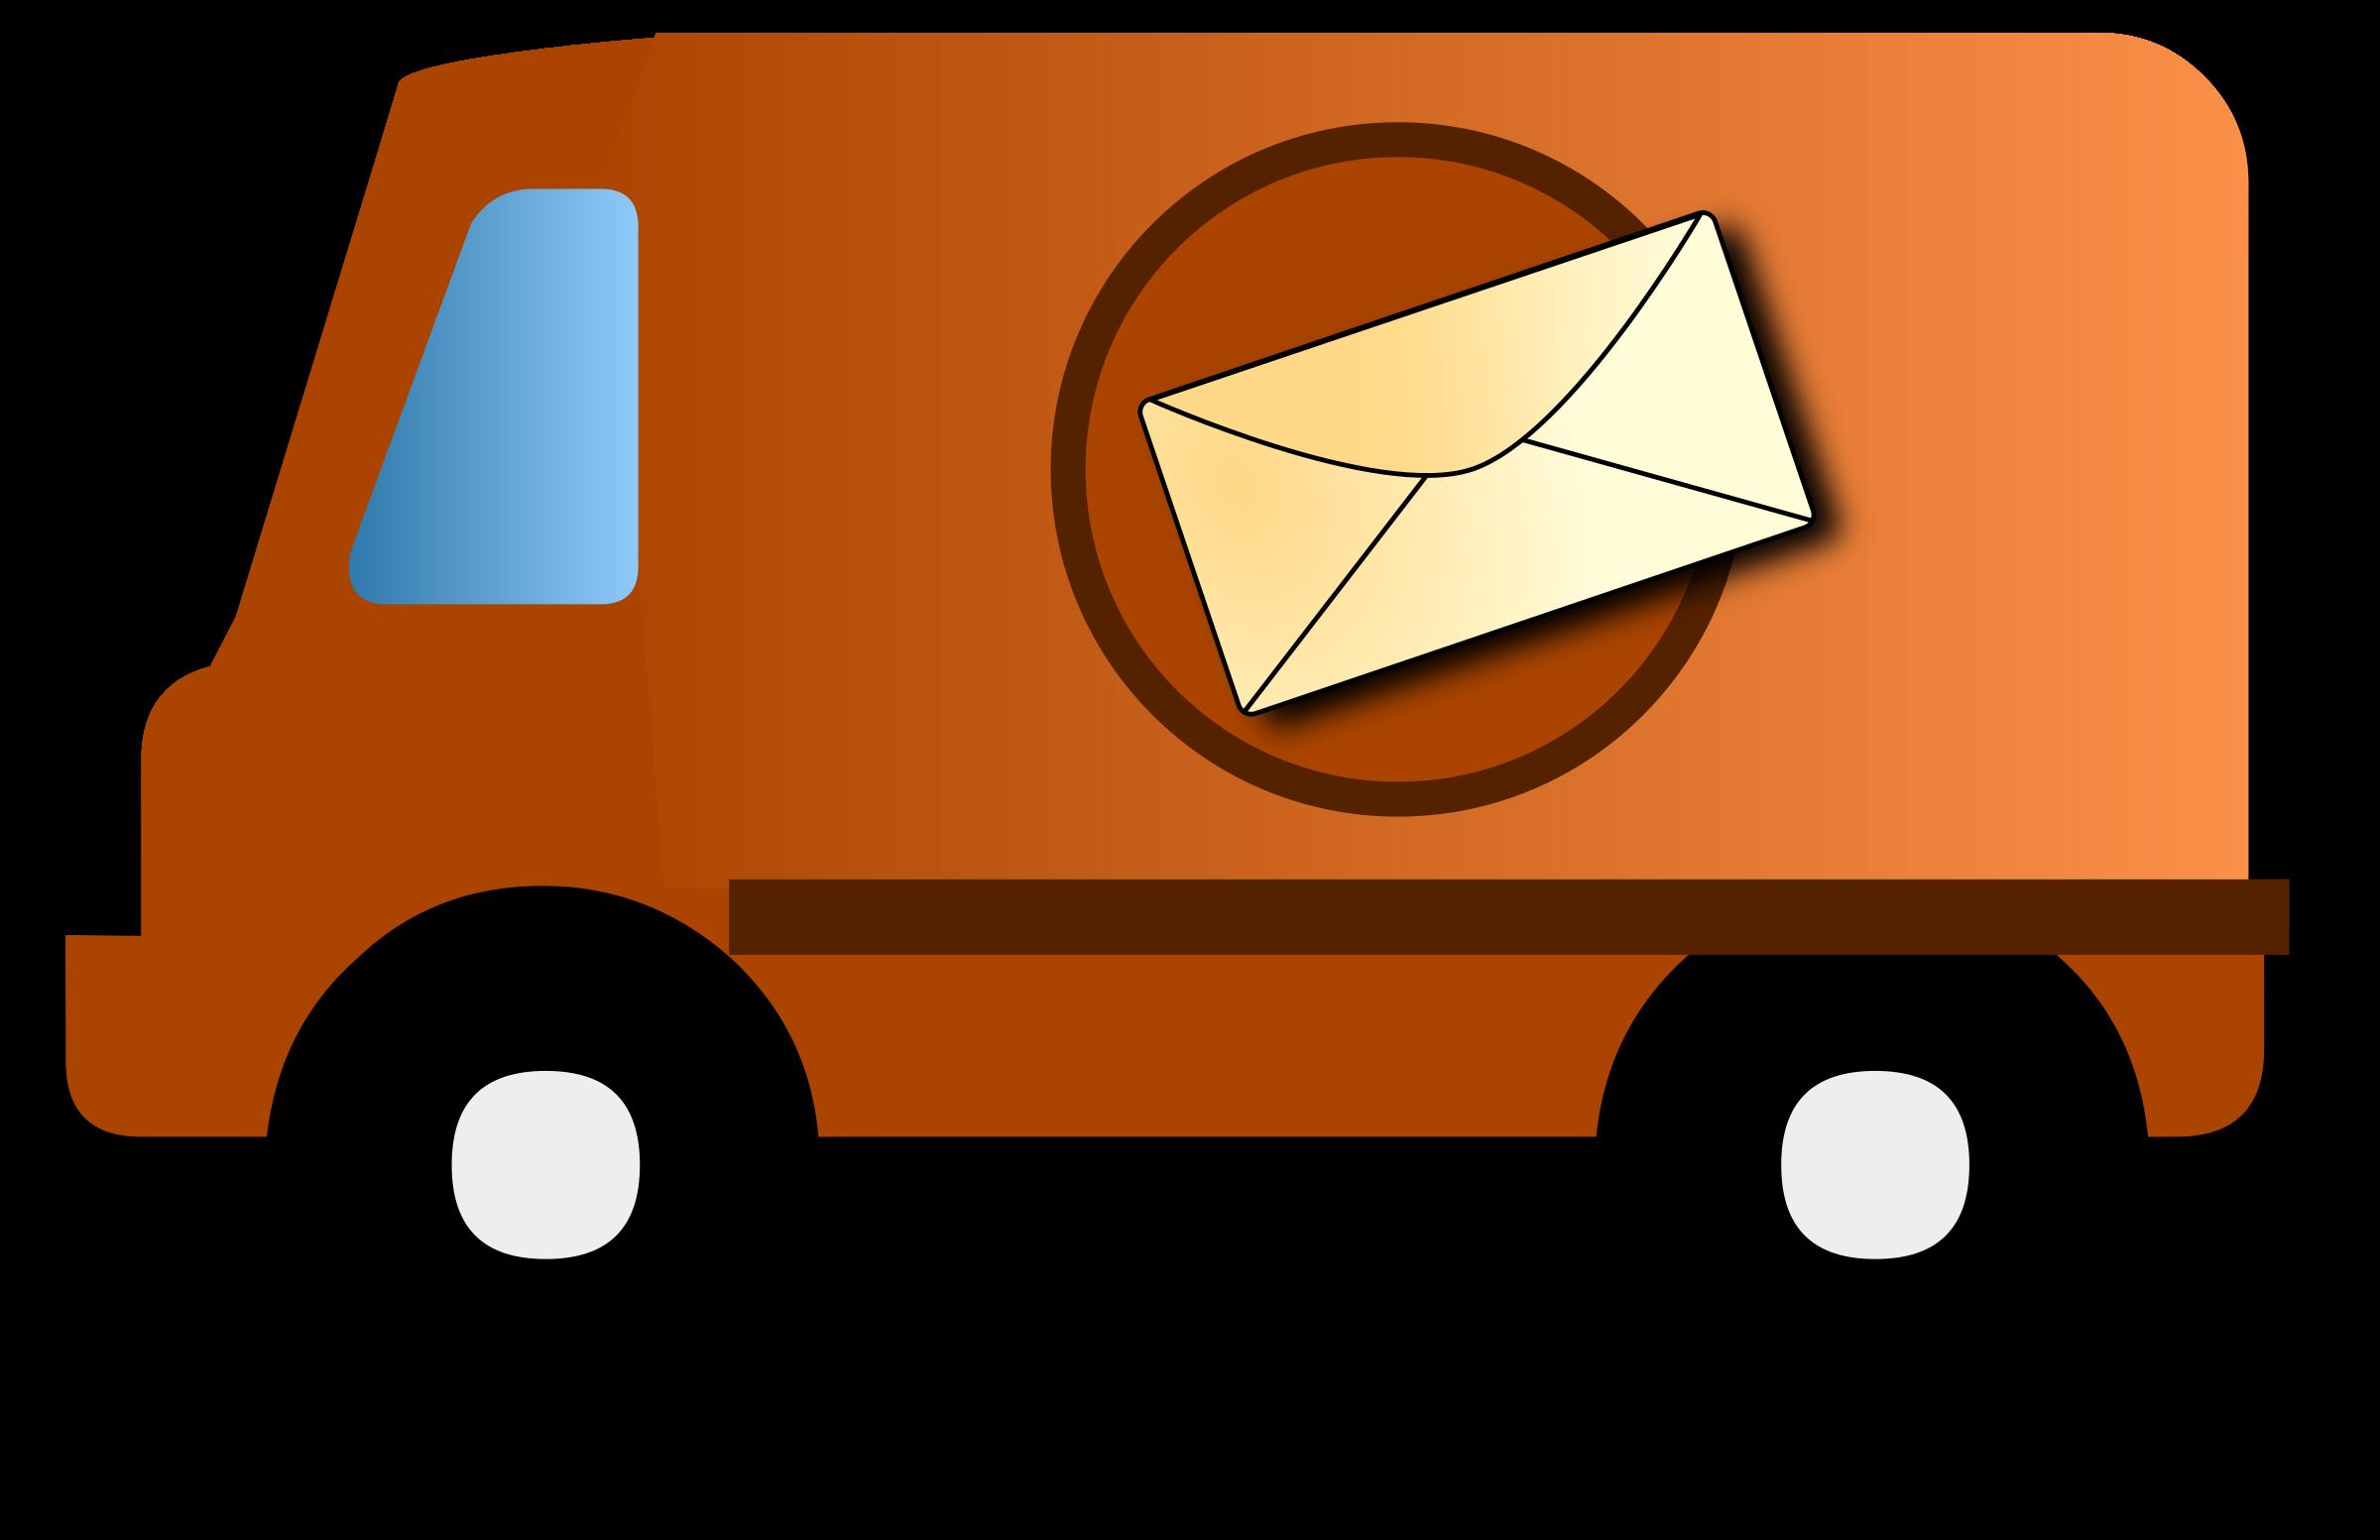 Mailman clipart animated, Mailman animated Transparent FREE.